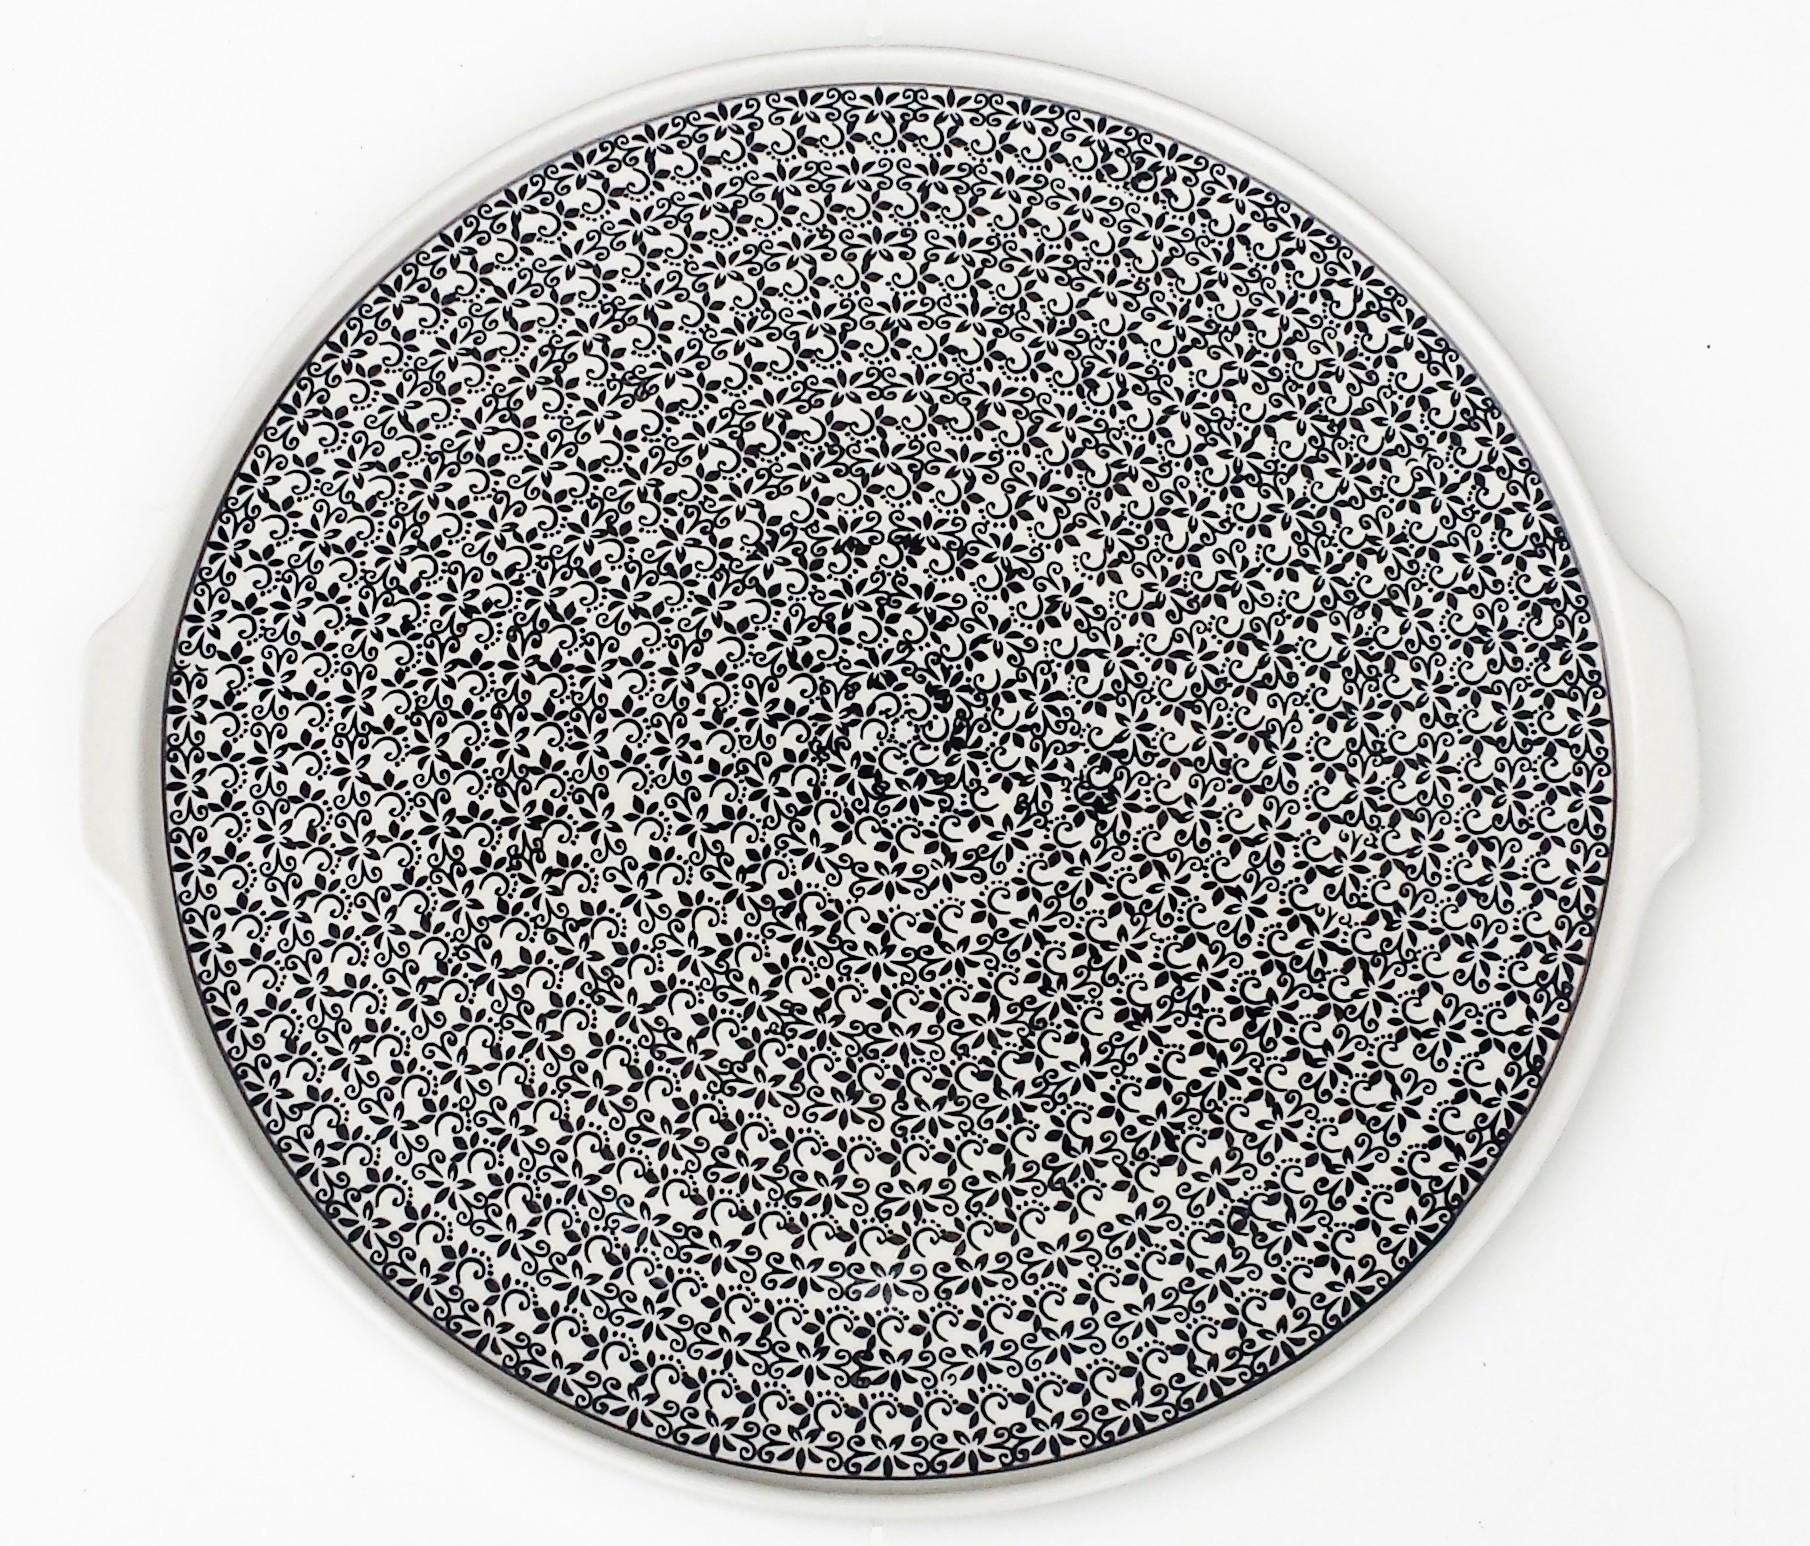 Pottery Avenue | Large Pizza Platter | CLASSIC